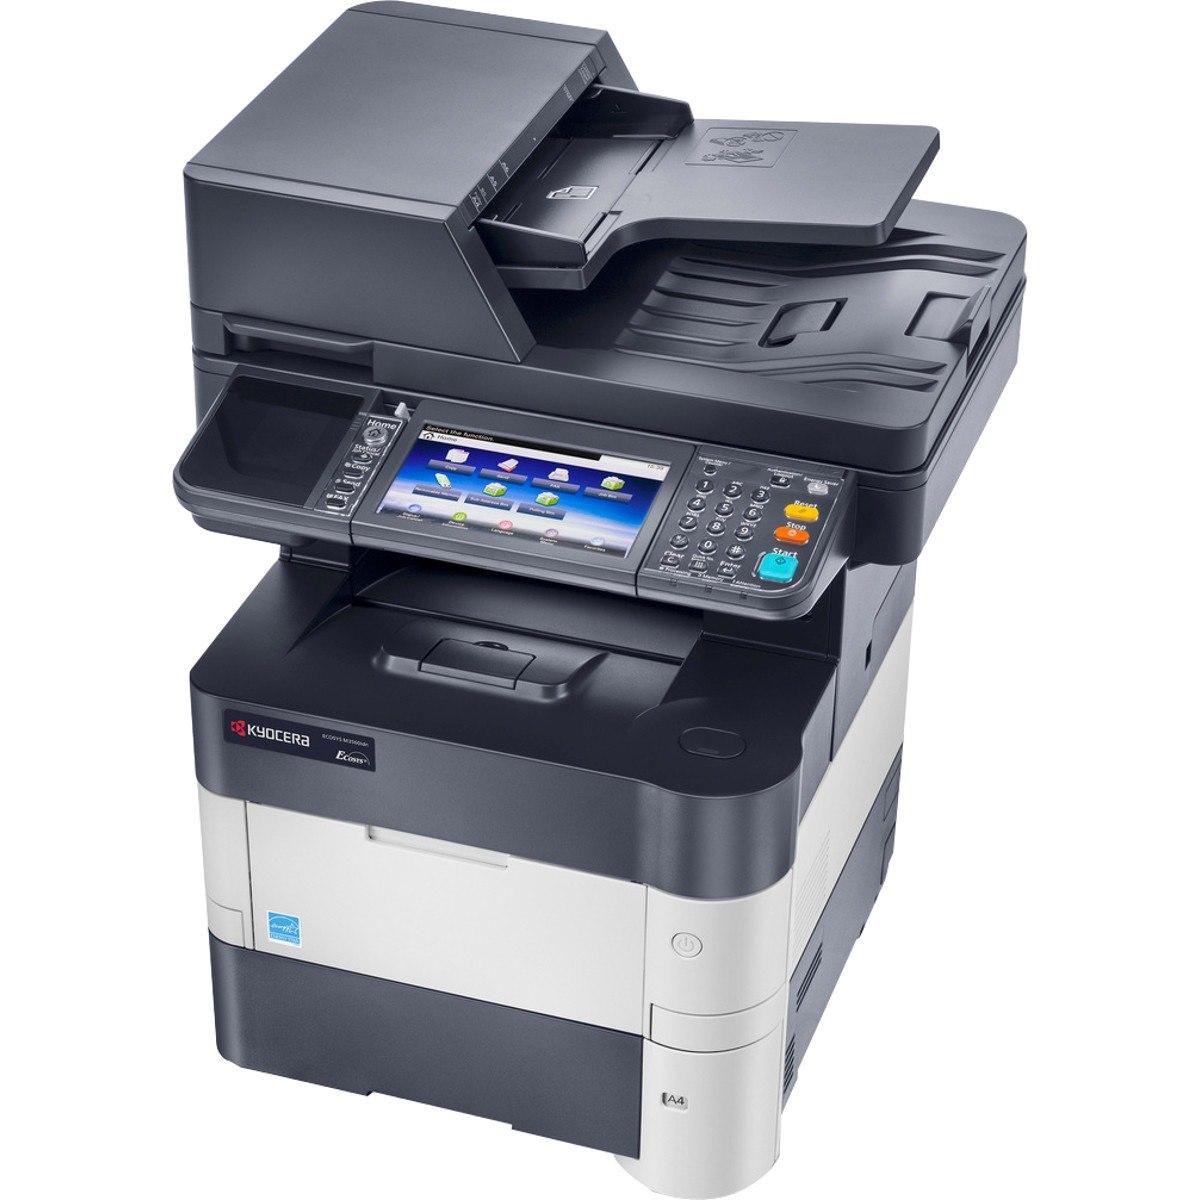 Buy Kyocera Ecosys M3540idn Laser Multifunction Printer